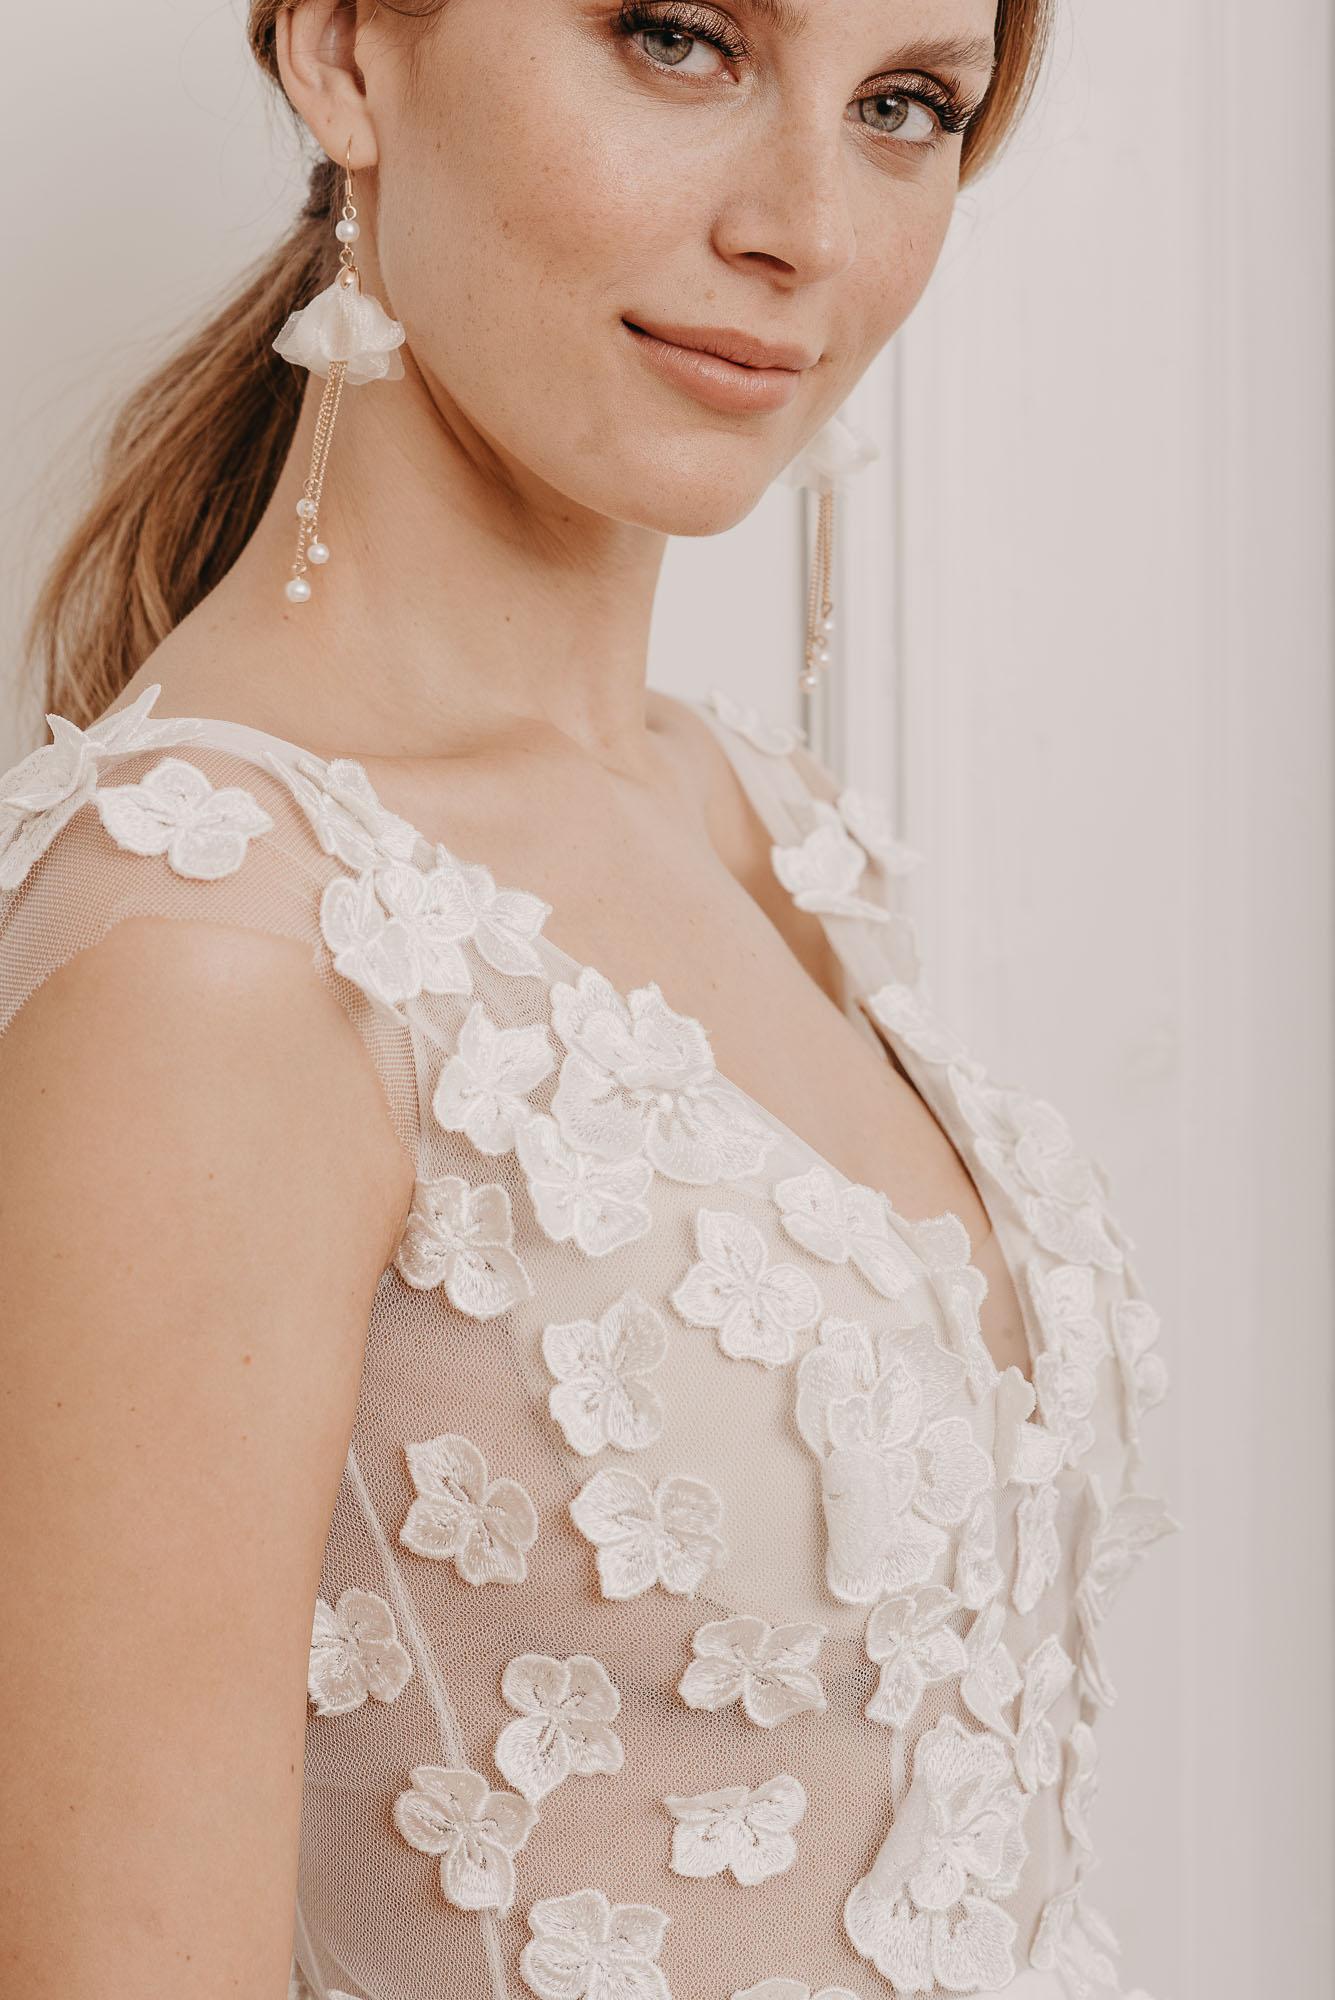 Lovage Brautkleid - Brautmode von Oonce